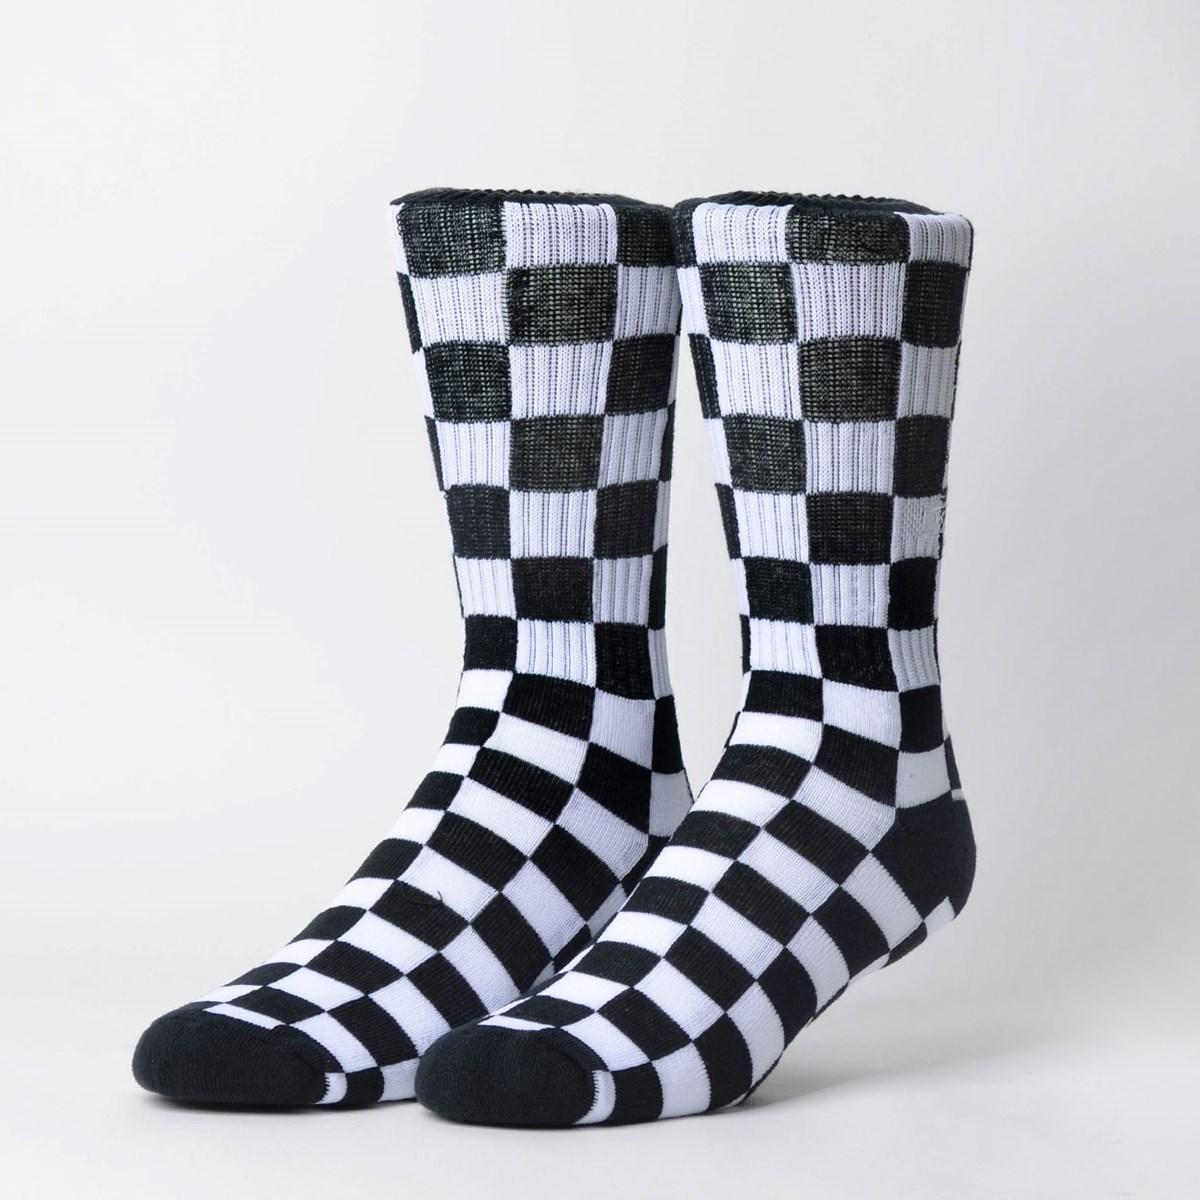 Meia Vans Feminina Checkerboard Crew II Black White Checkboard VN0A3H3OUH0